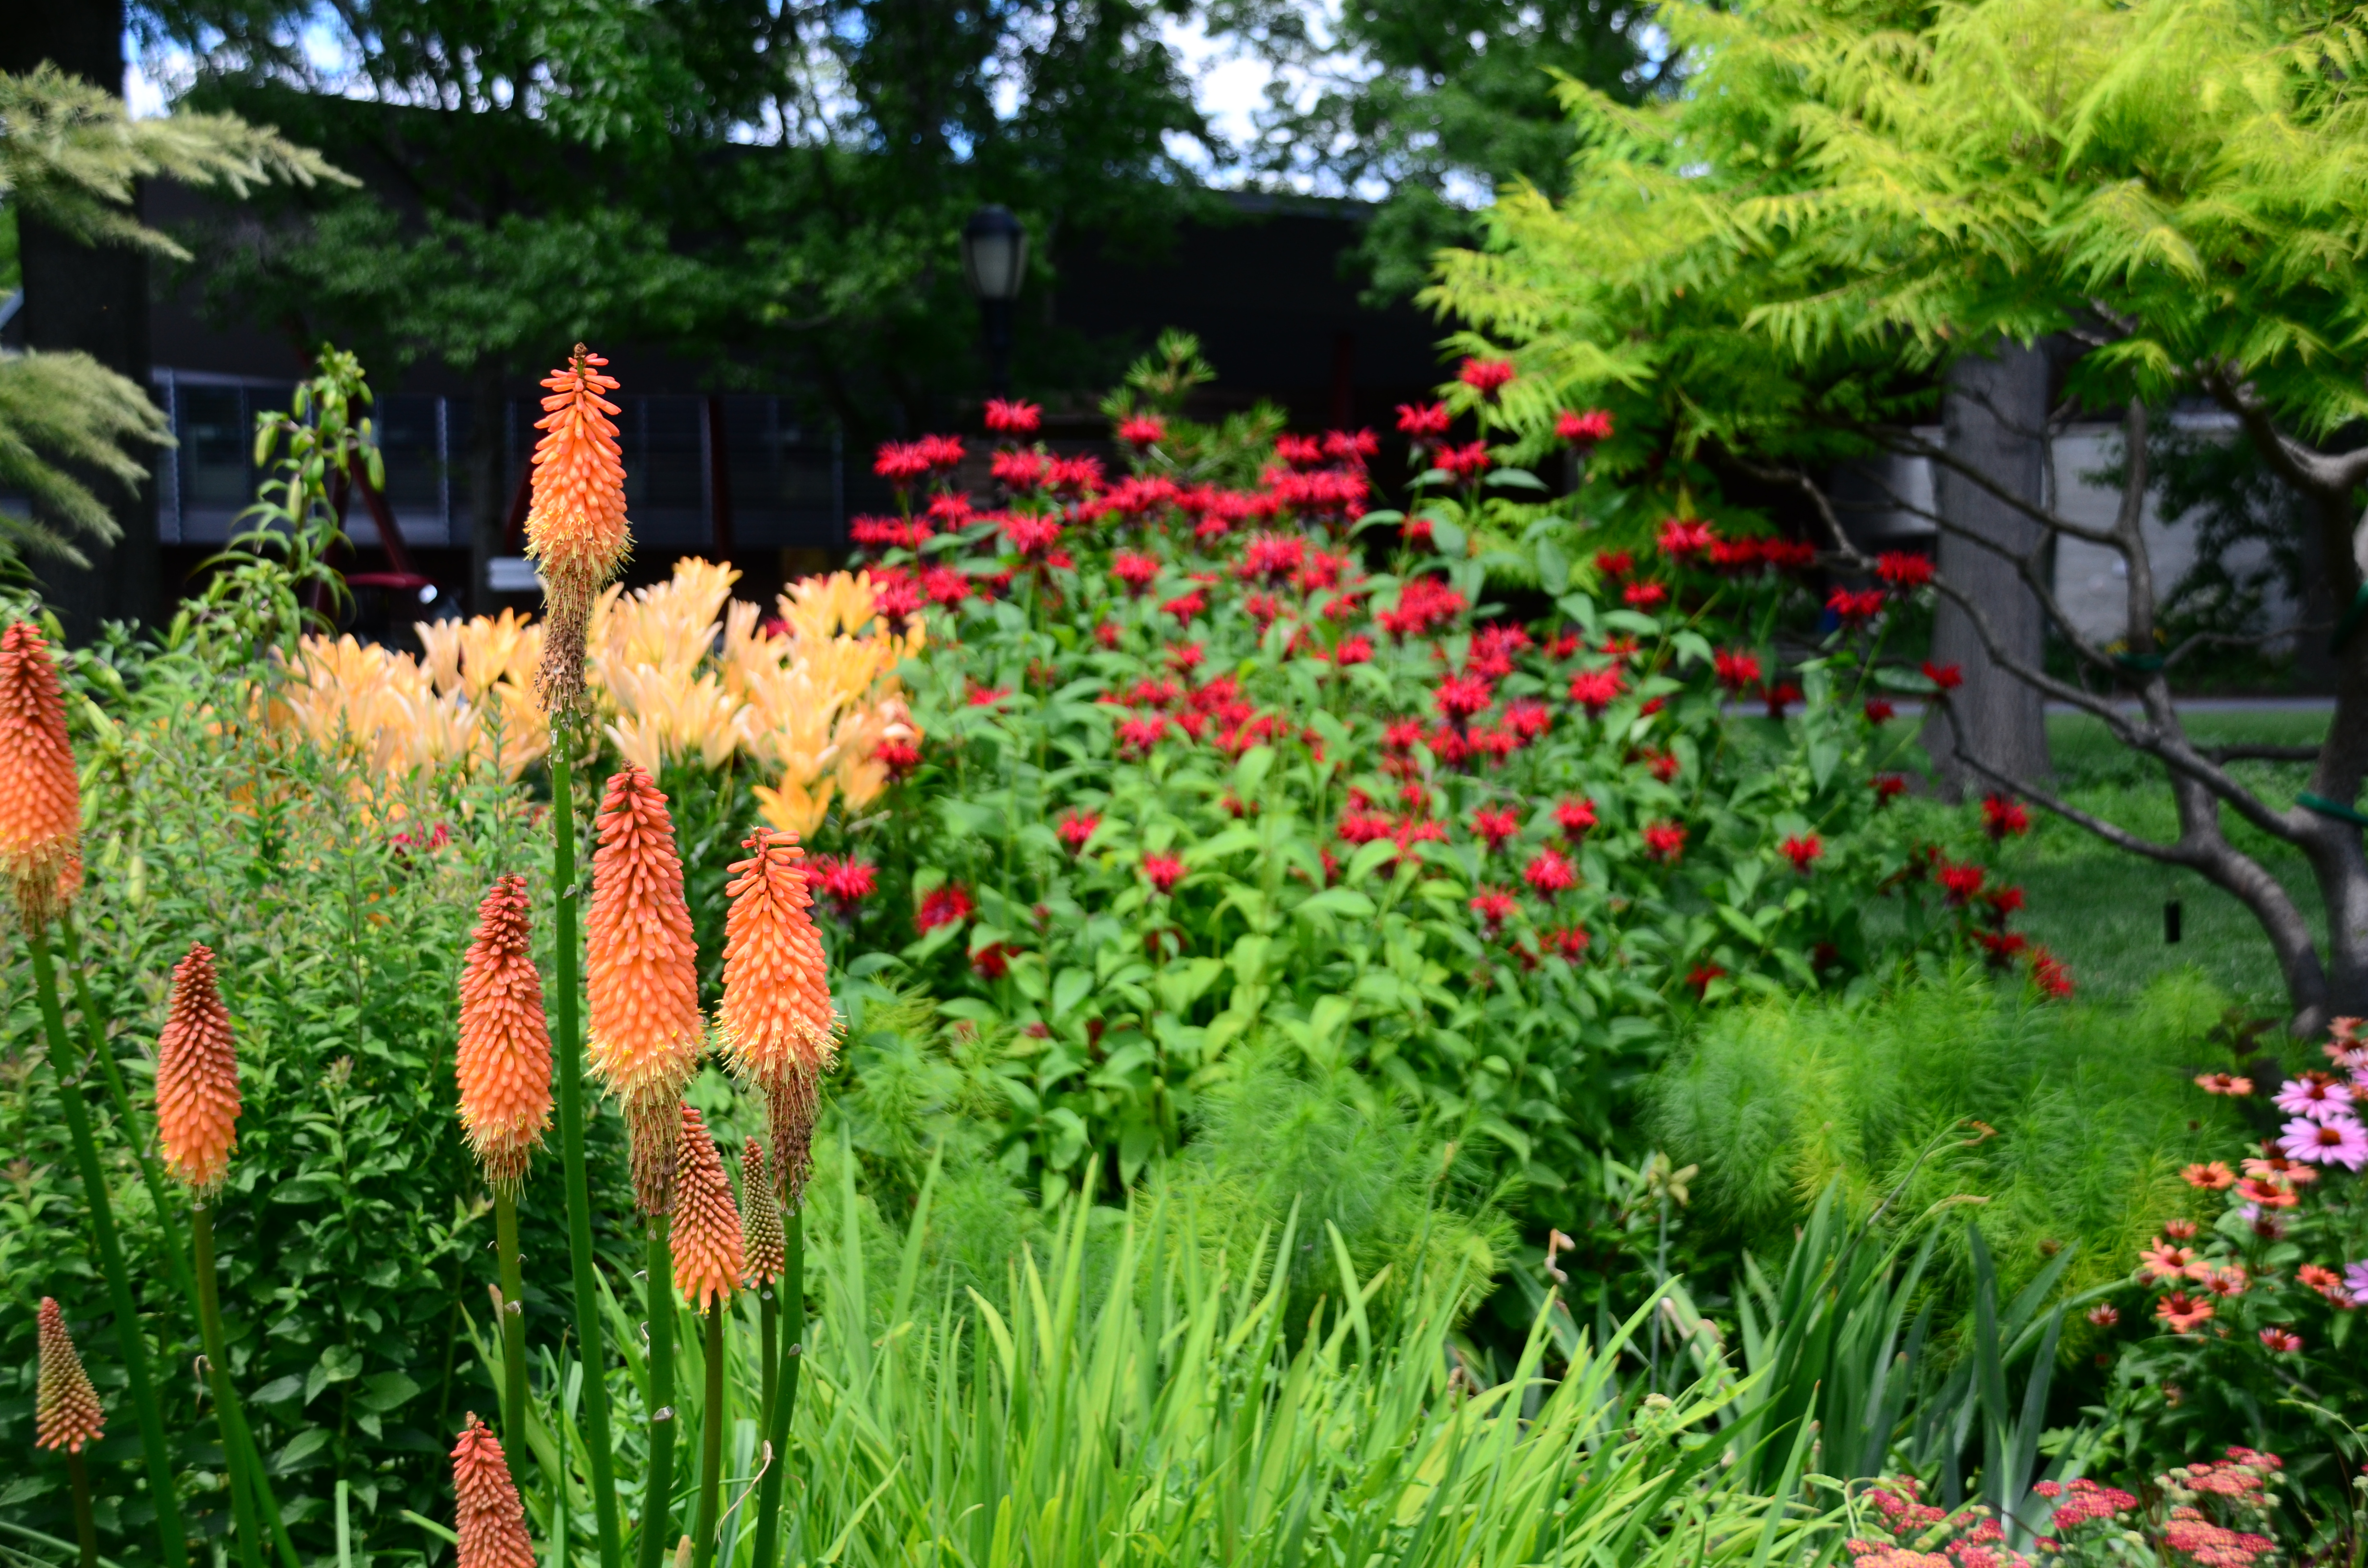 2017 7 5 Credit Jess Brey27 Queens Botanical Garden